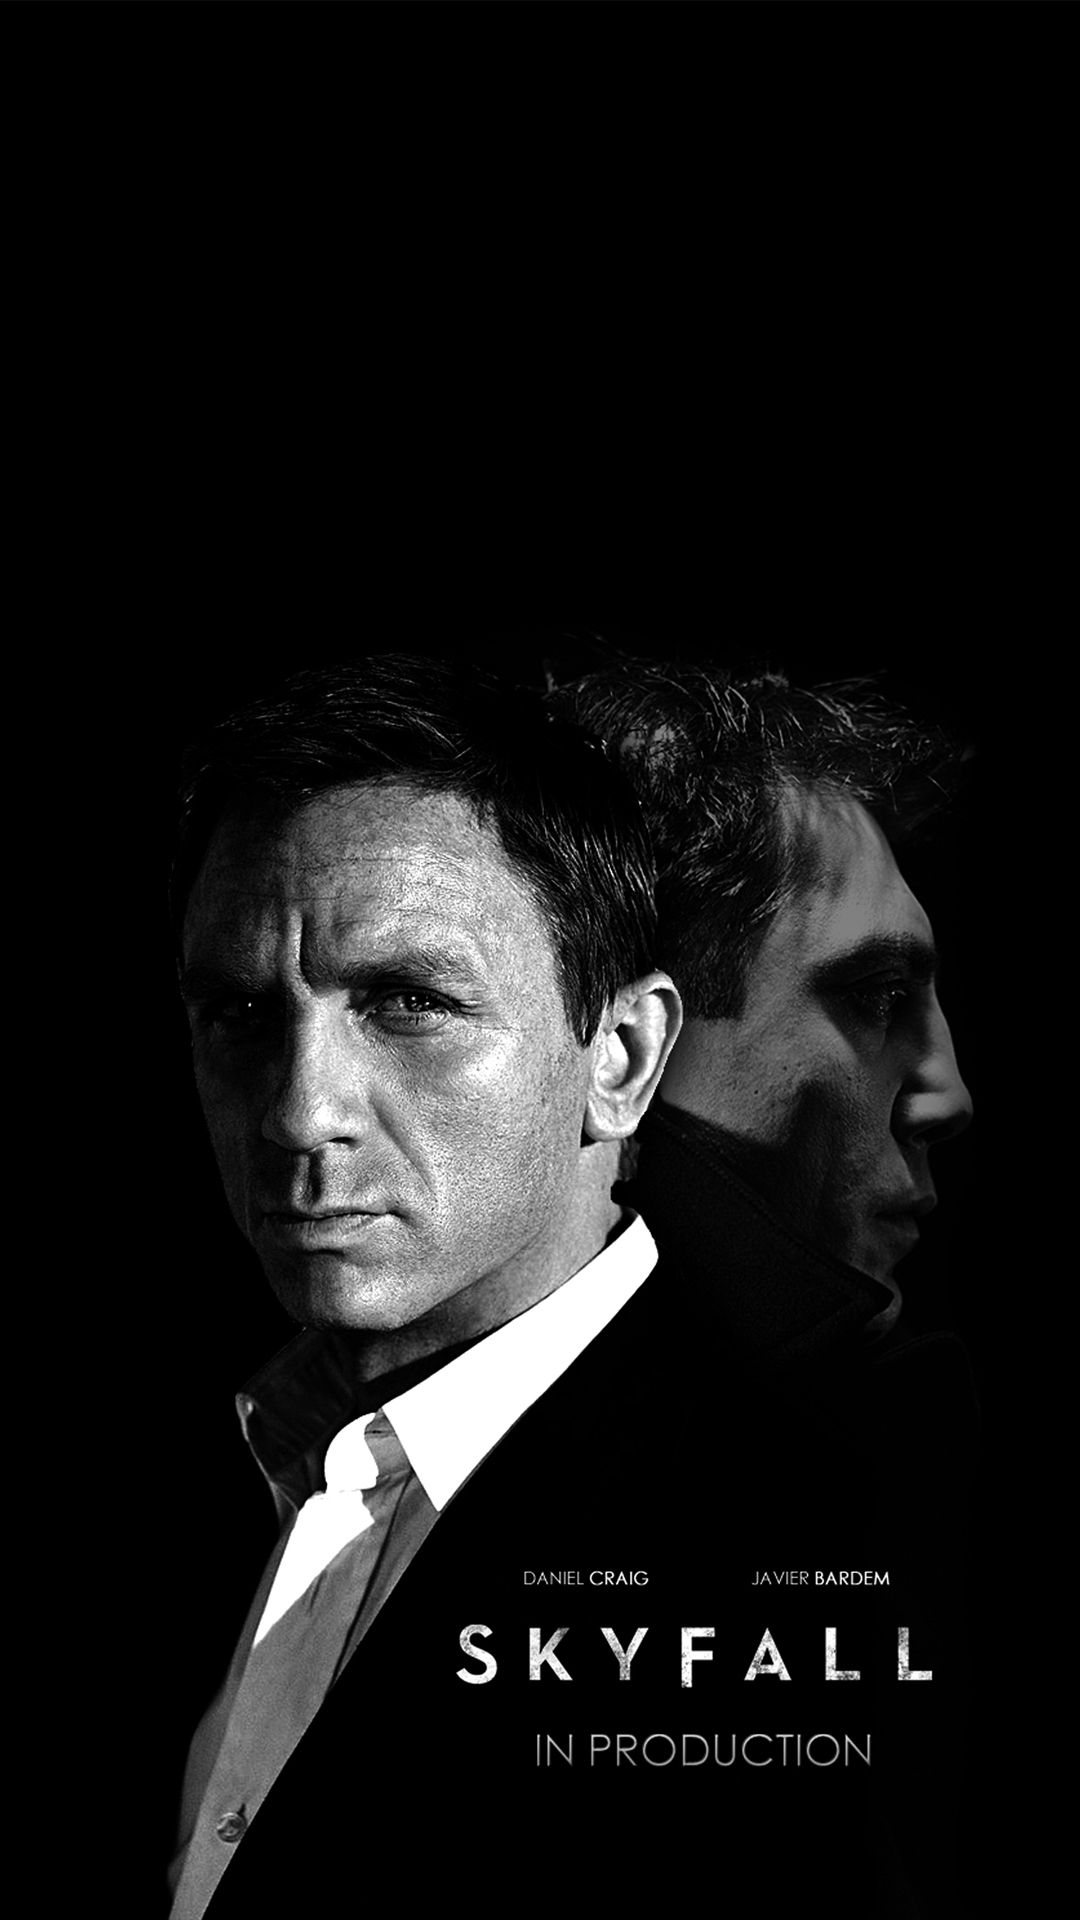 James bond skyfall 007 best htc one wallpapers - 007 wallpaper 4k ...